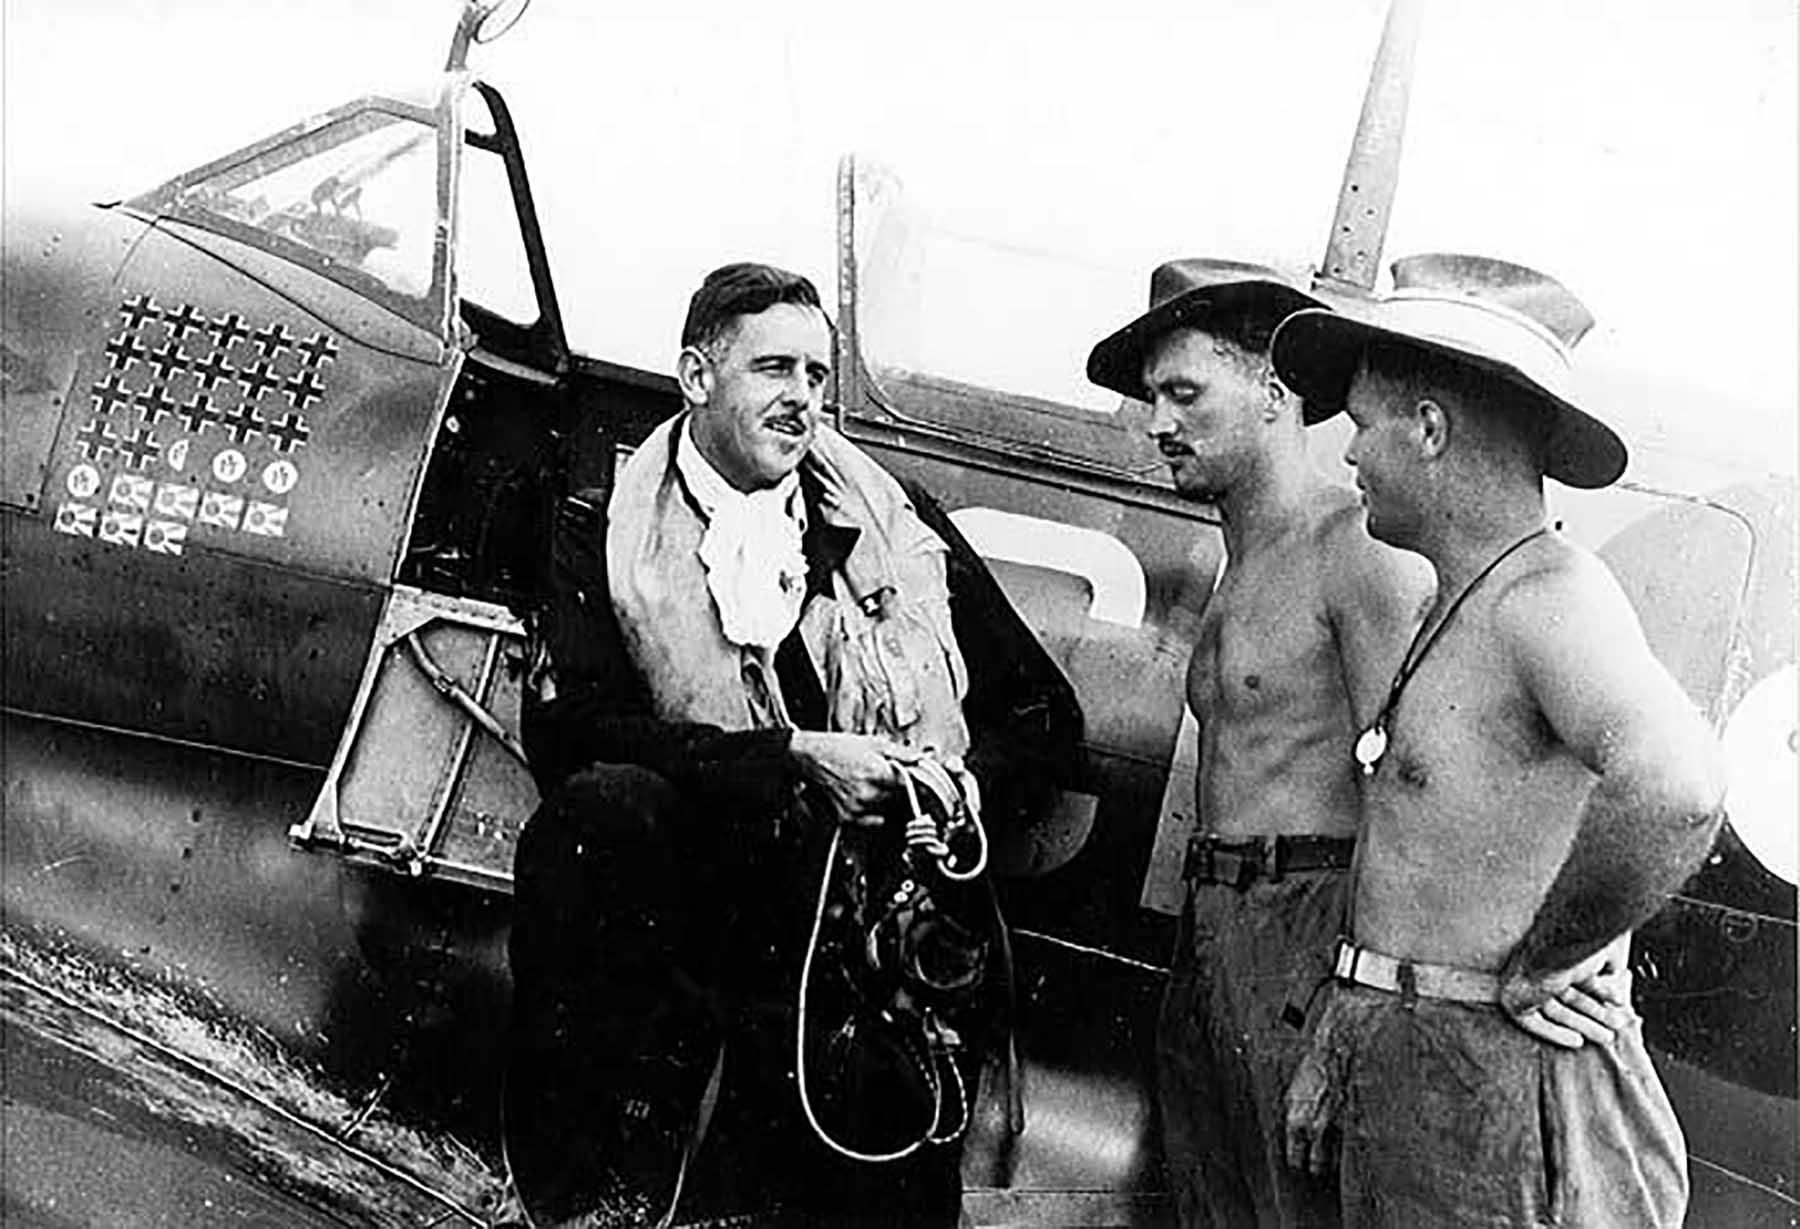 Aircrew RAAF Grp Capt Clive R Caldwell Morotai 1944 01